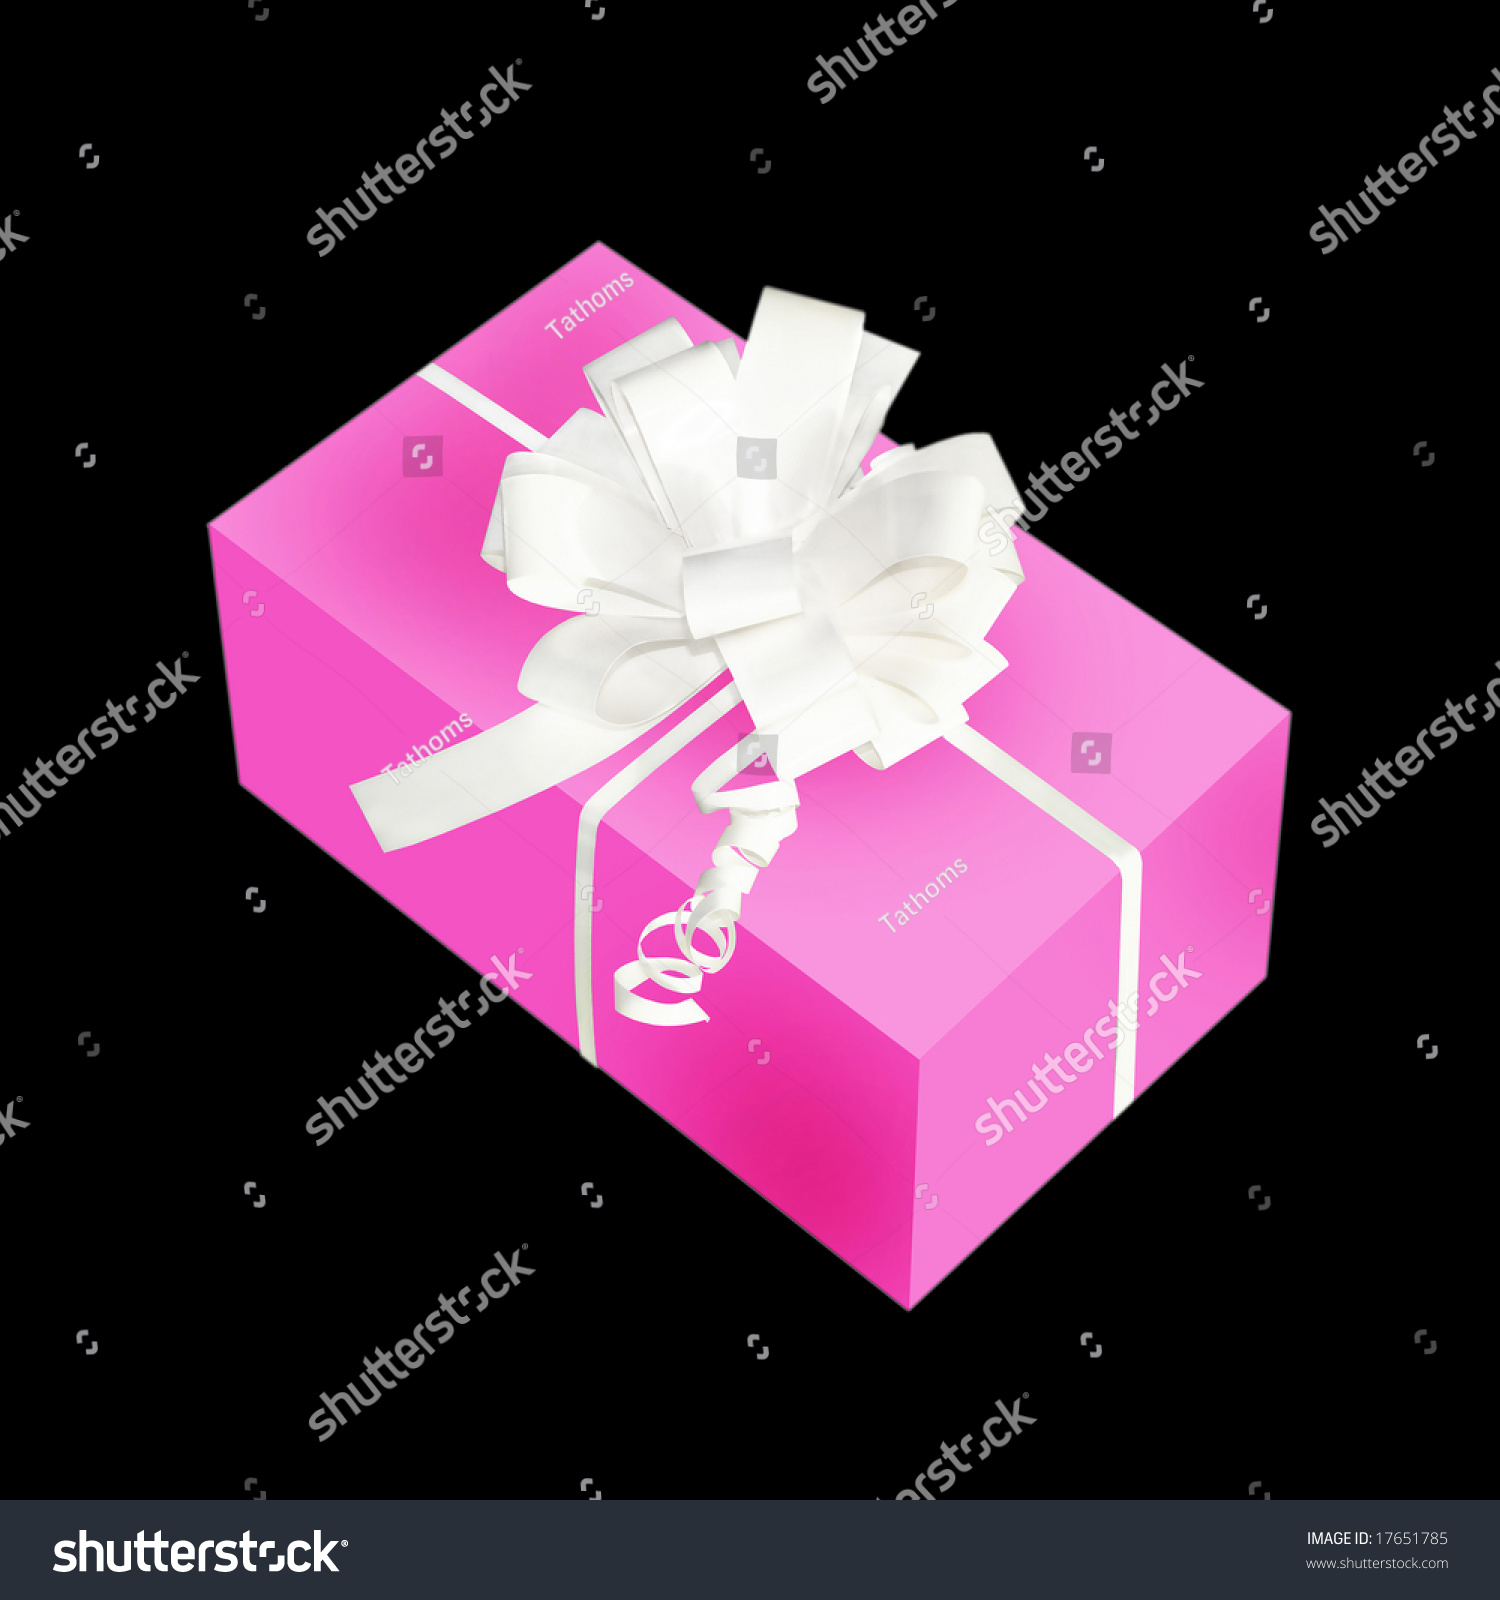 stock-photo-girly-very-pink-gift-bix-176